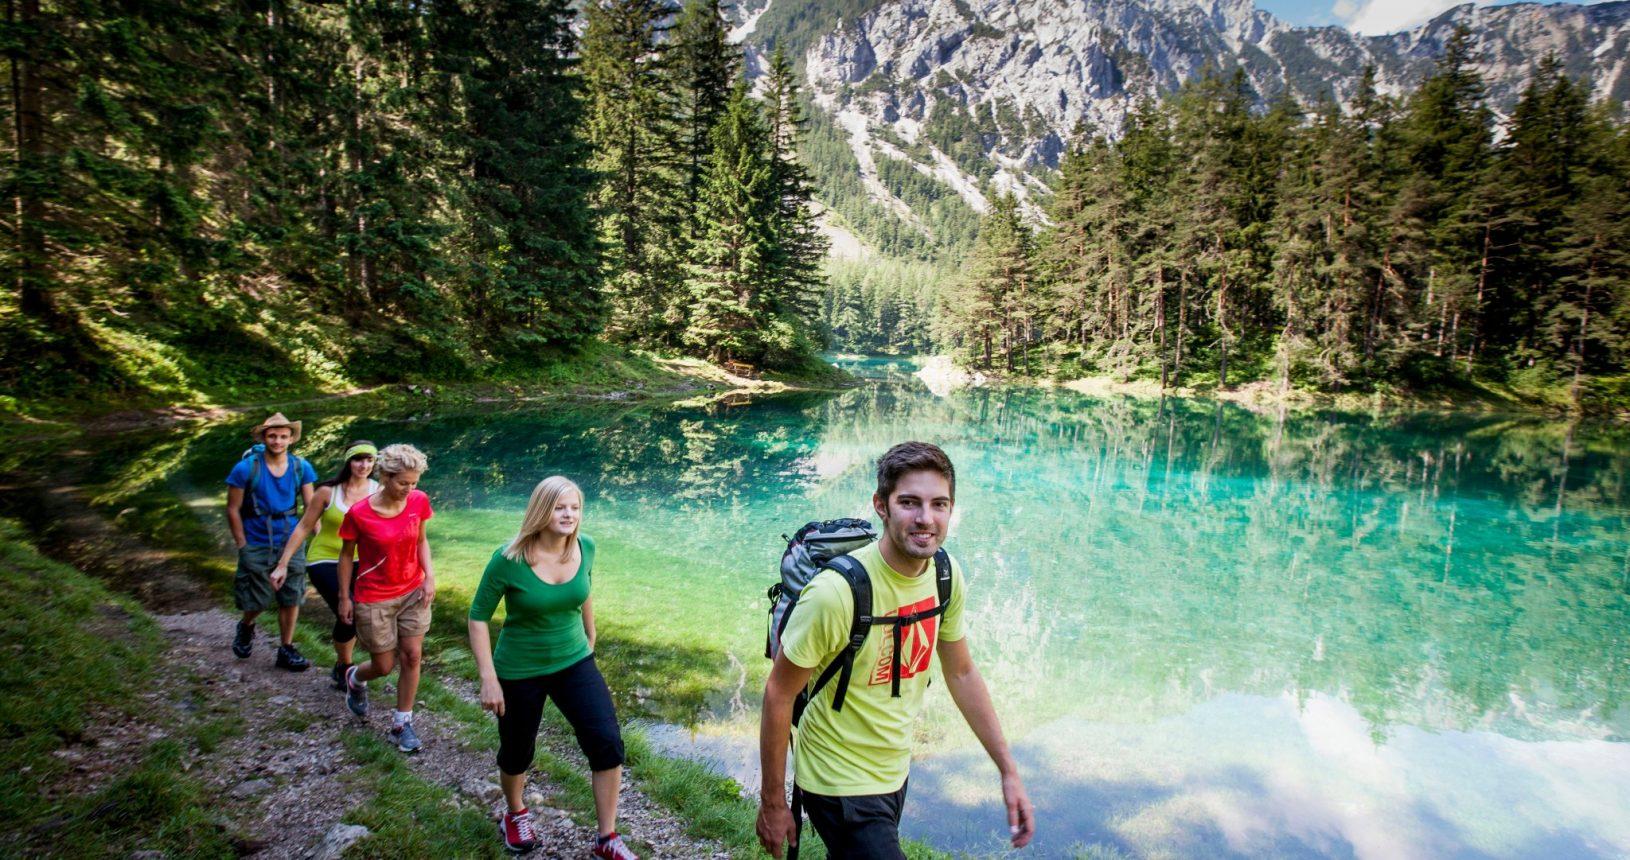 Alpesi szállás - www.alpesikaland.hu - Hotel-Banhof - Alpesi-gyalogtúrák15